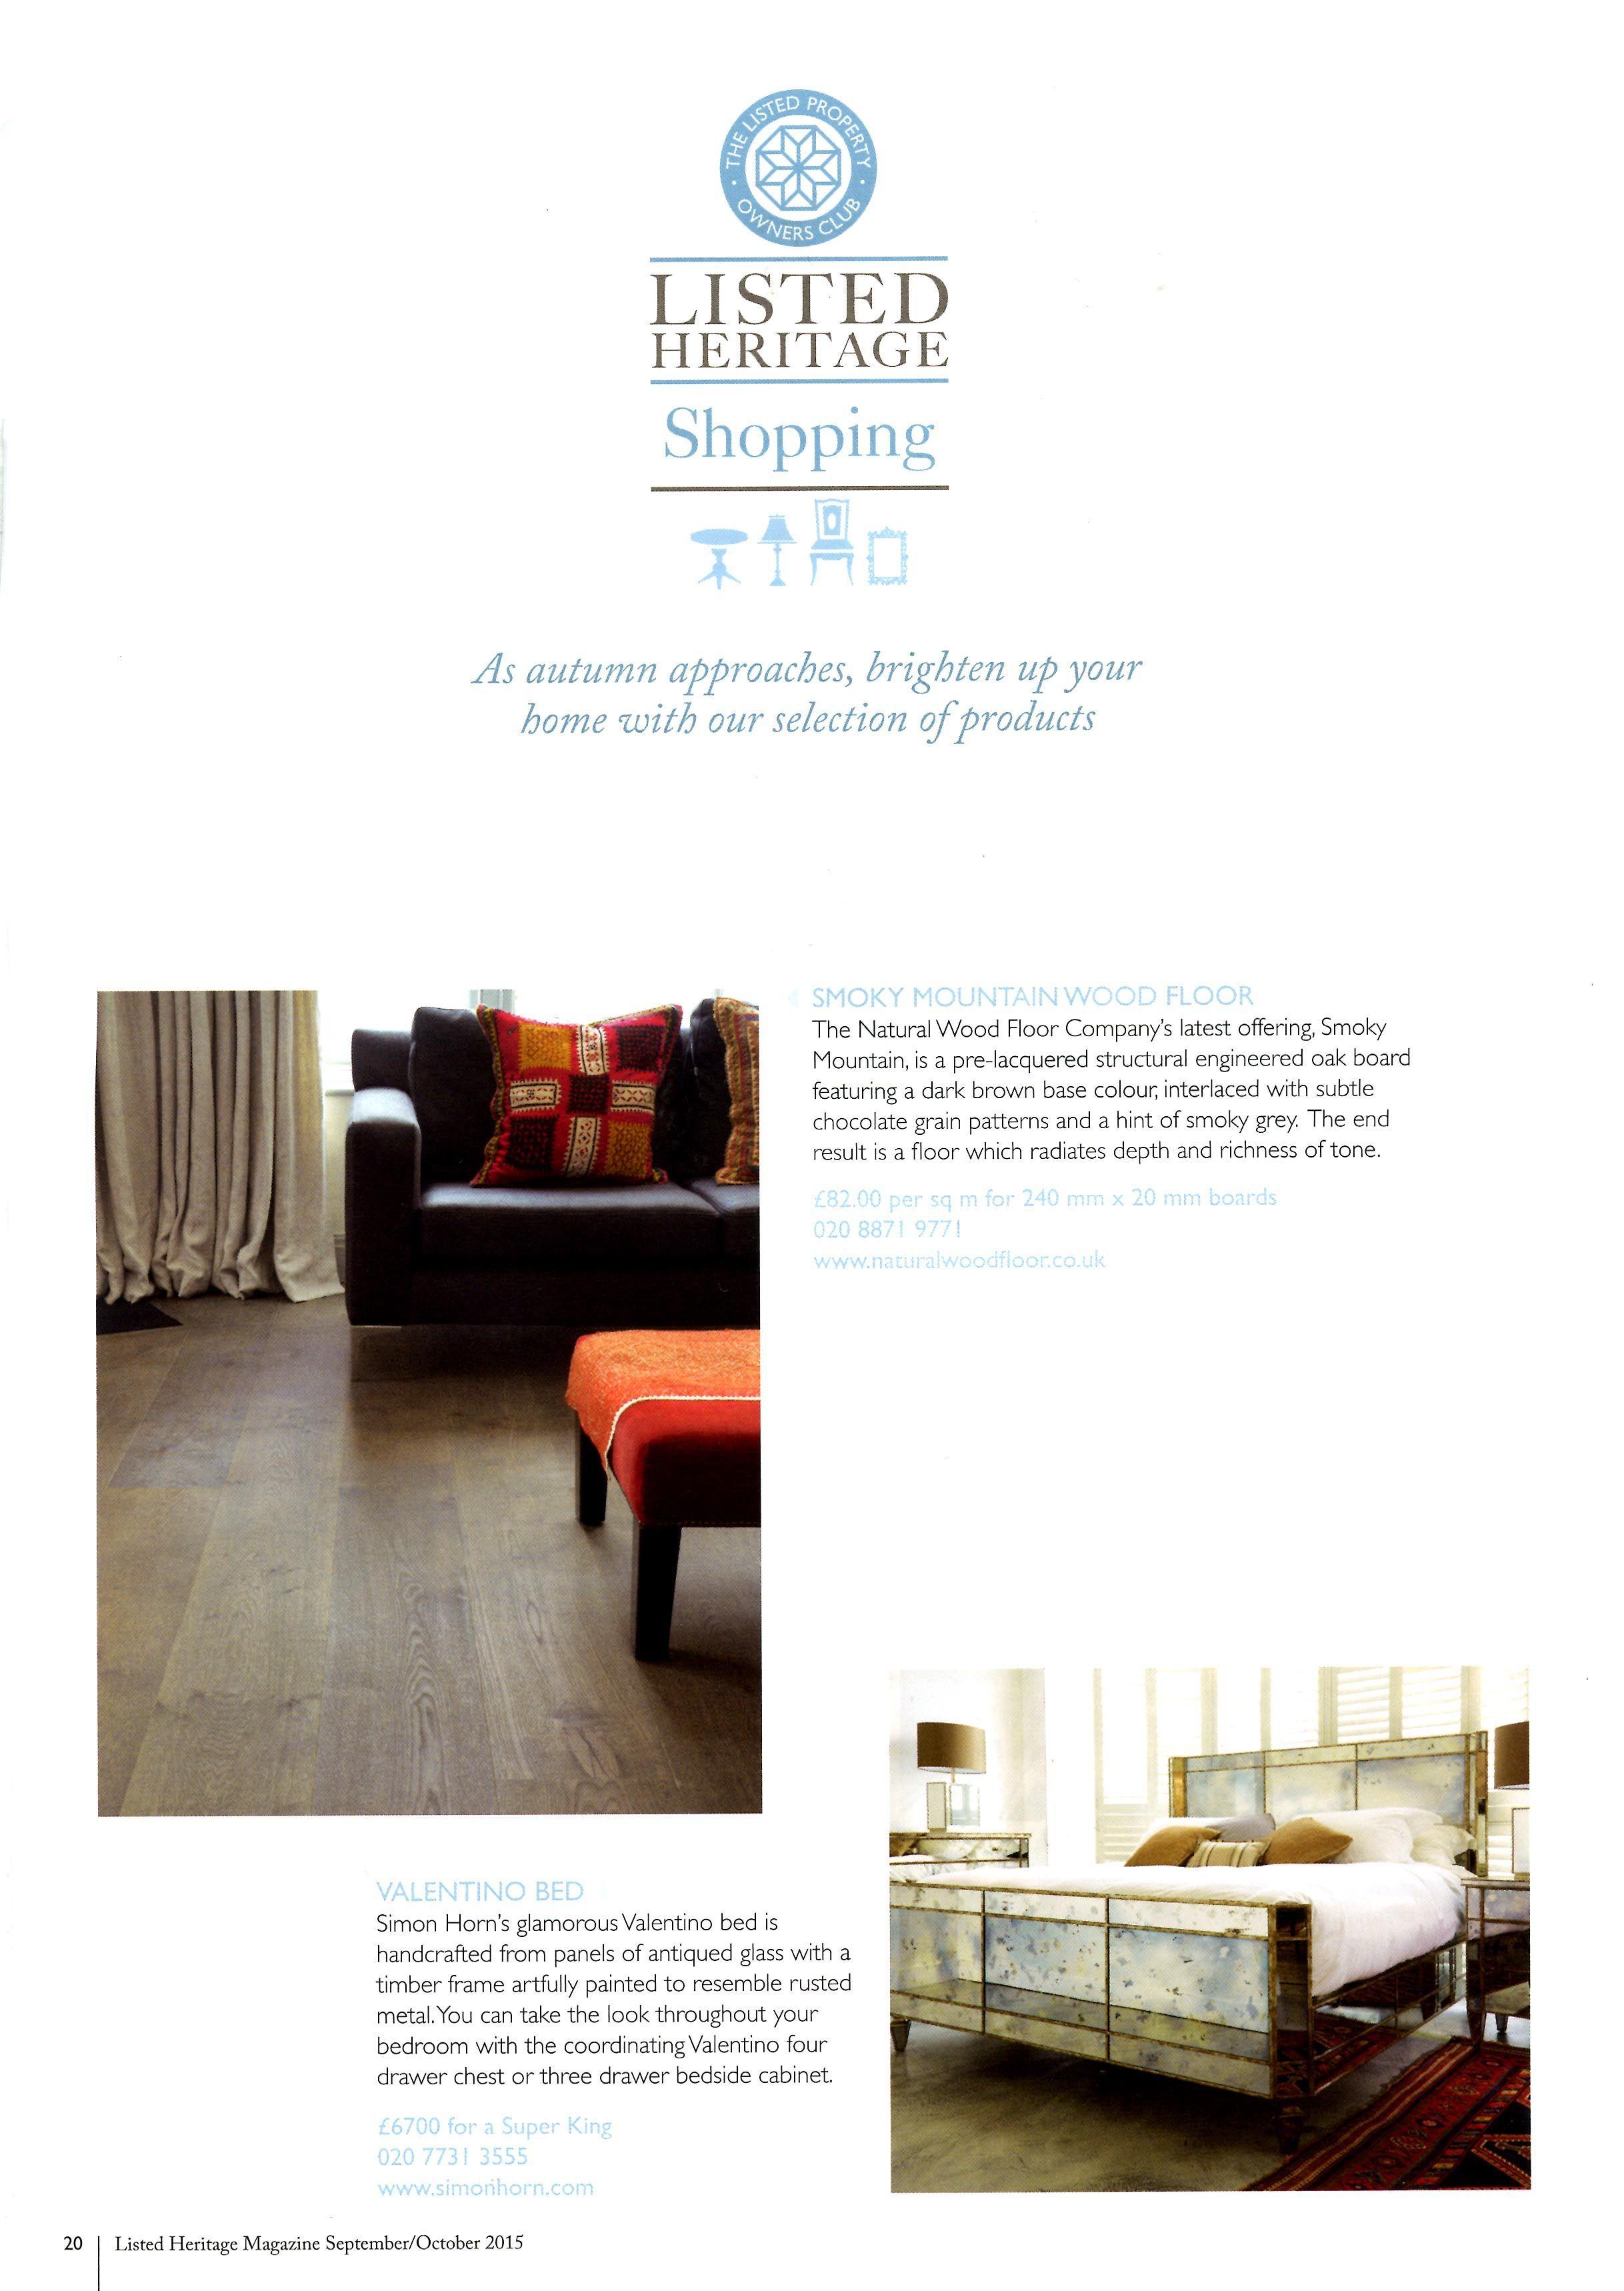 Simon Horn's glamorous mirrored Valentino bed simonhorn.com Listed Heritage October 2015